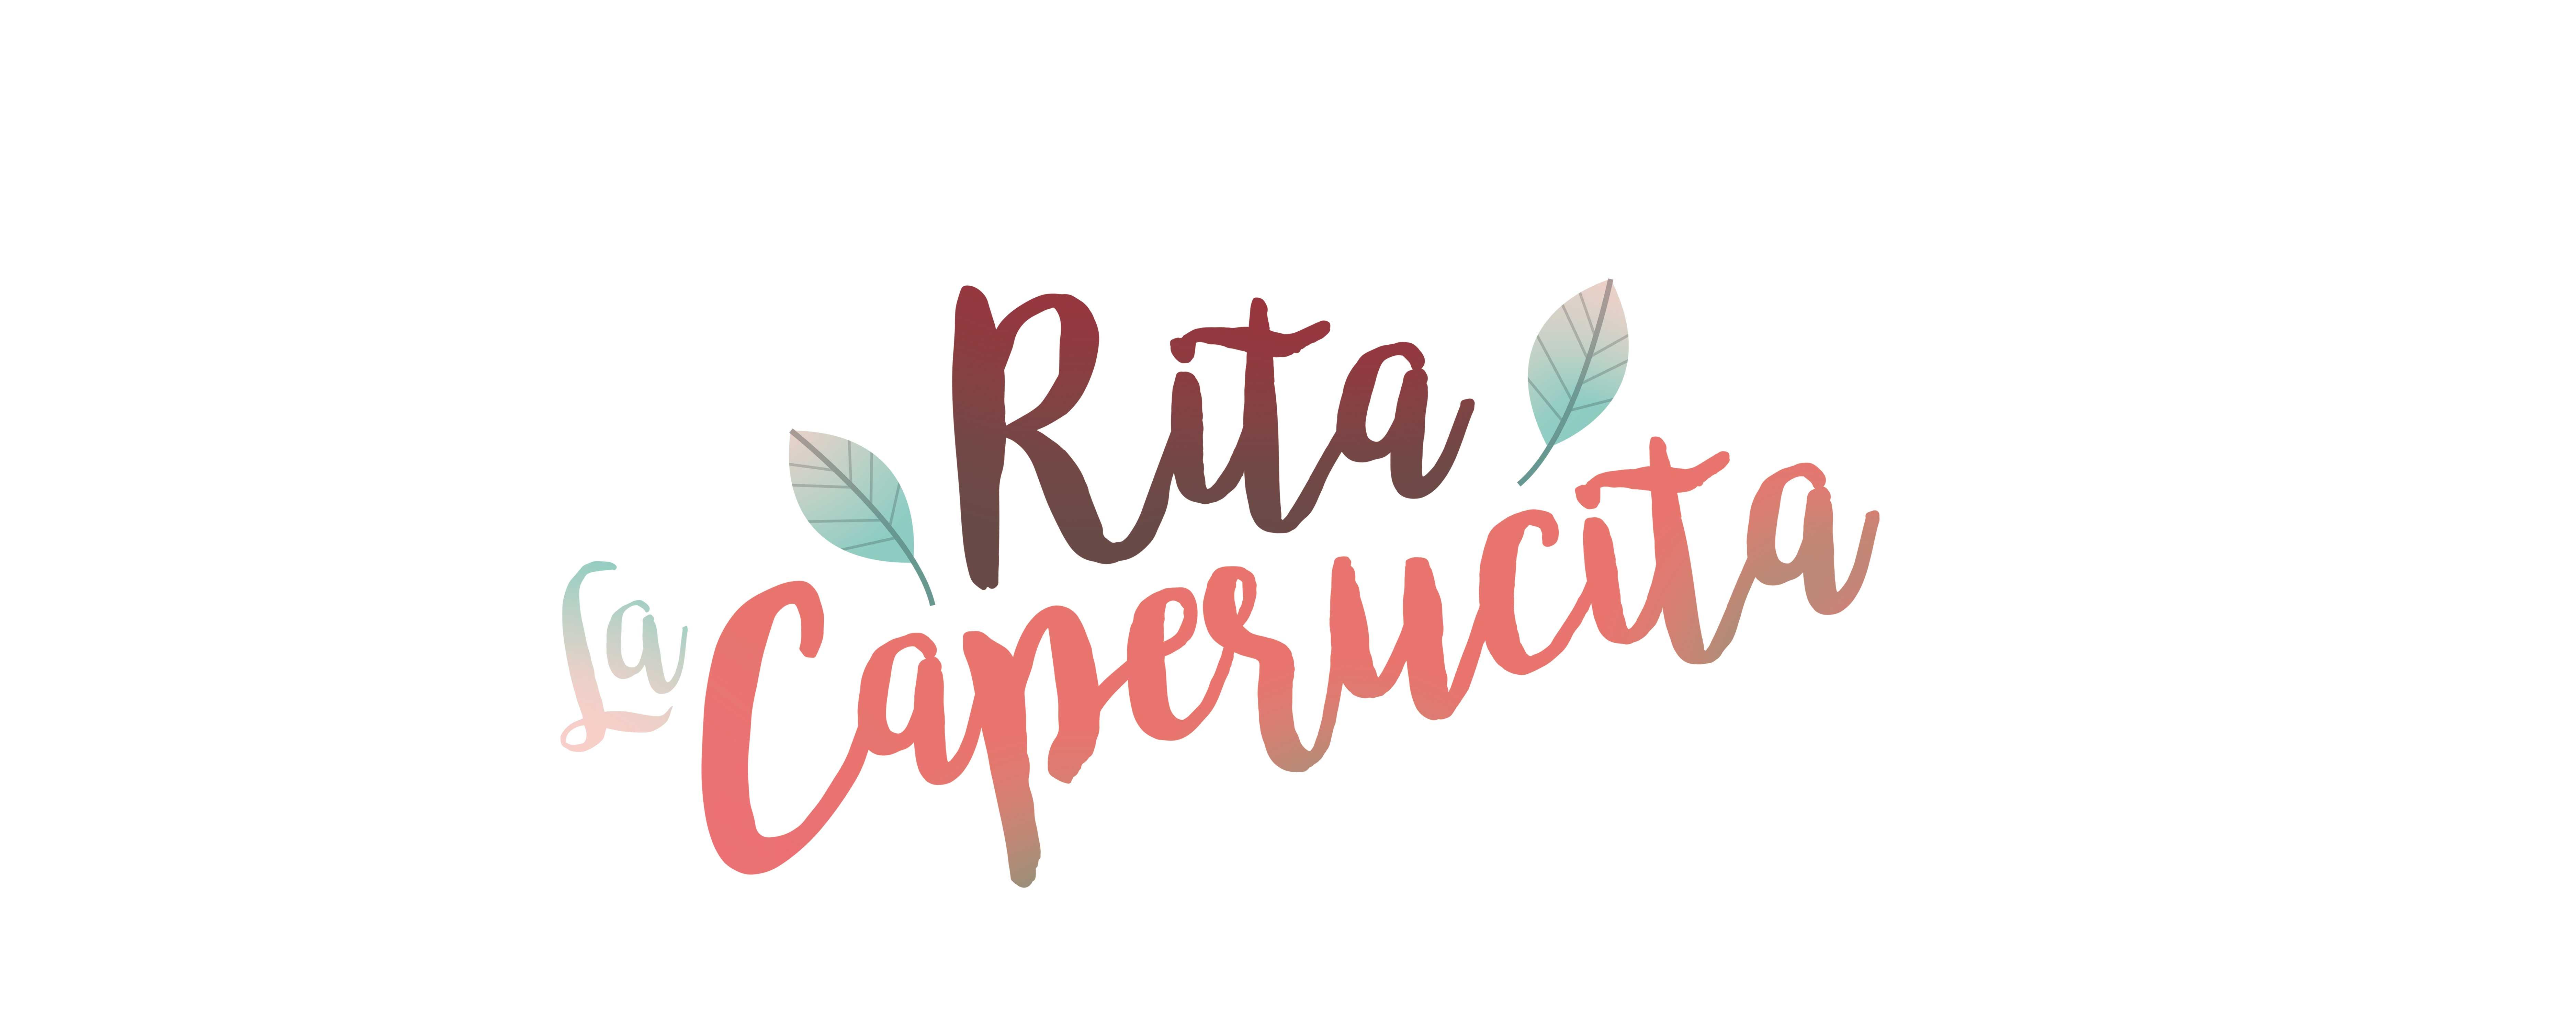 ilustracion_infantil_rita-la-caperucita_ilustradora